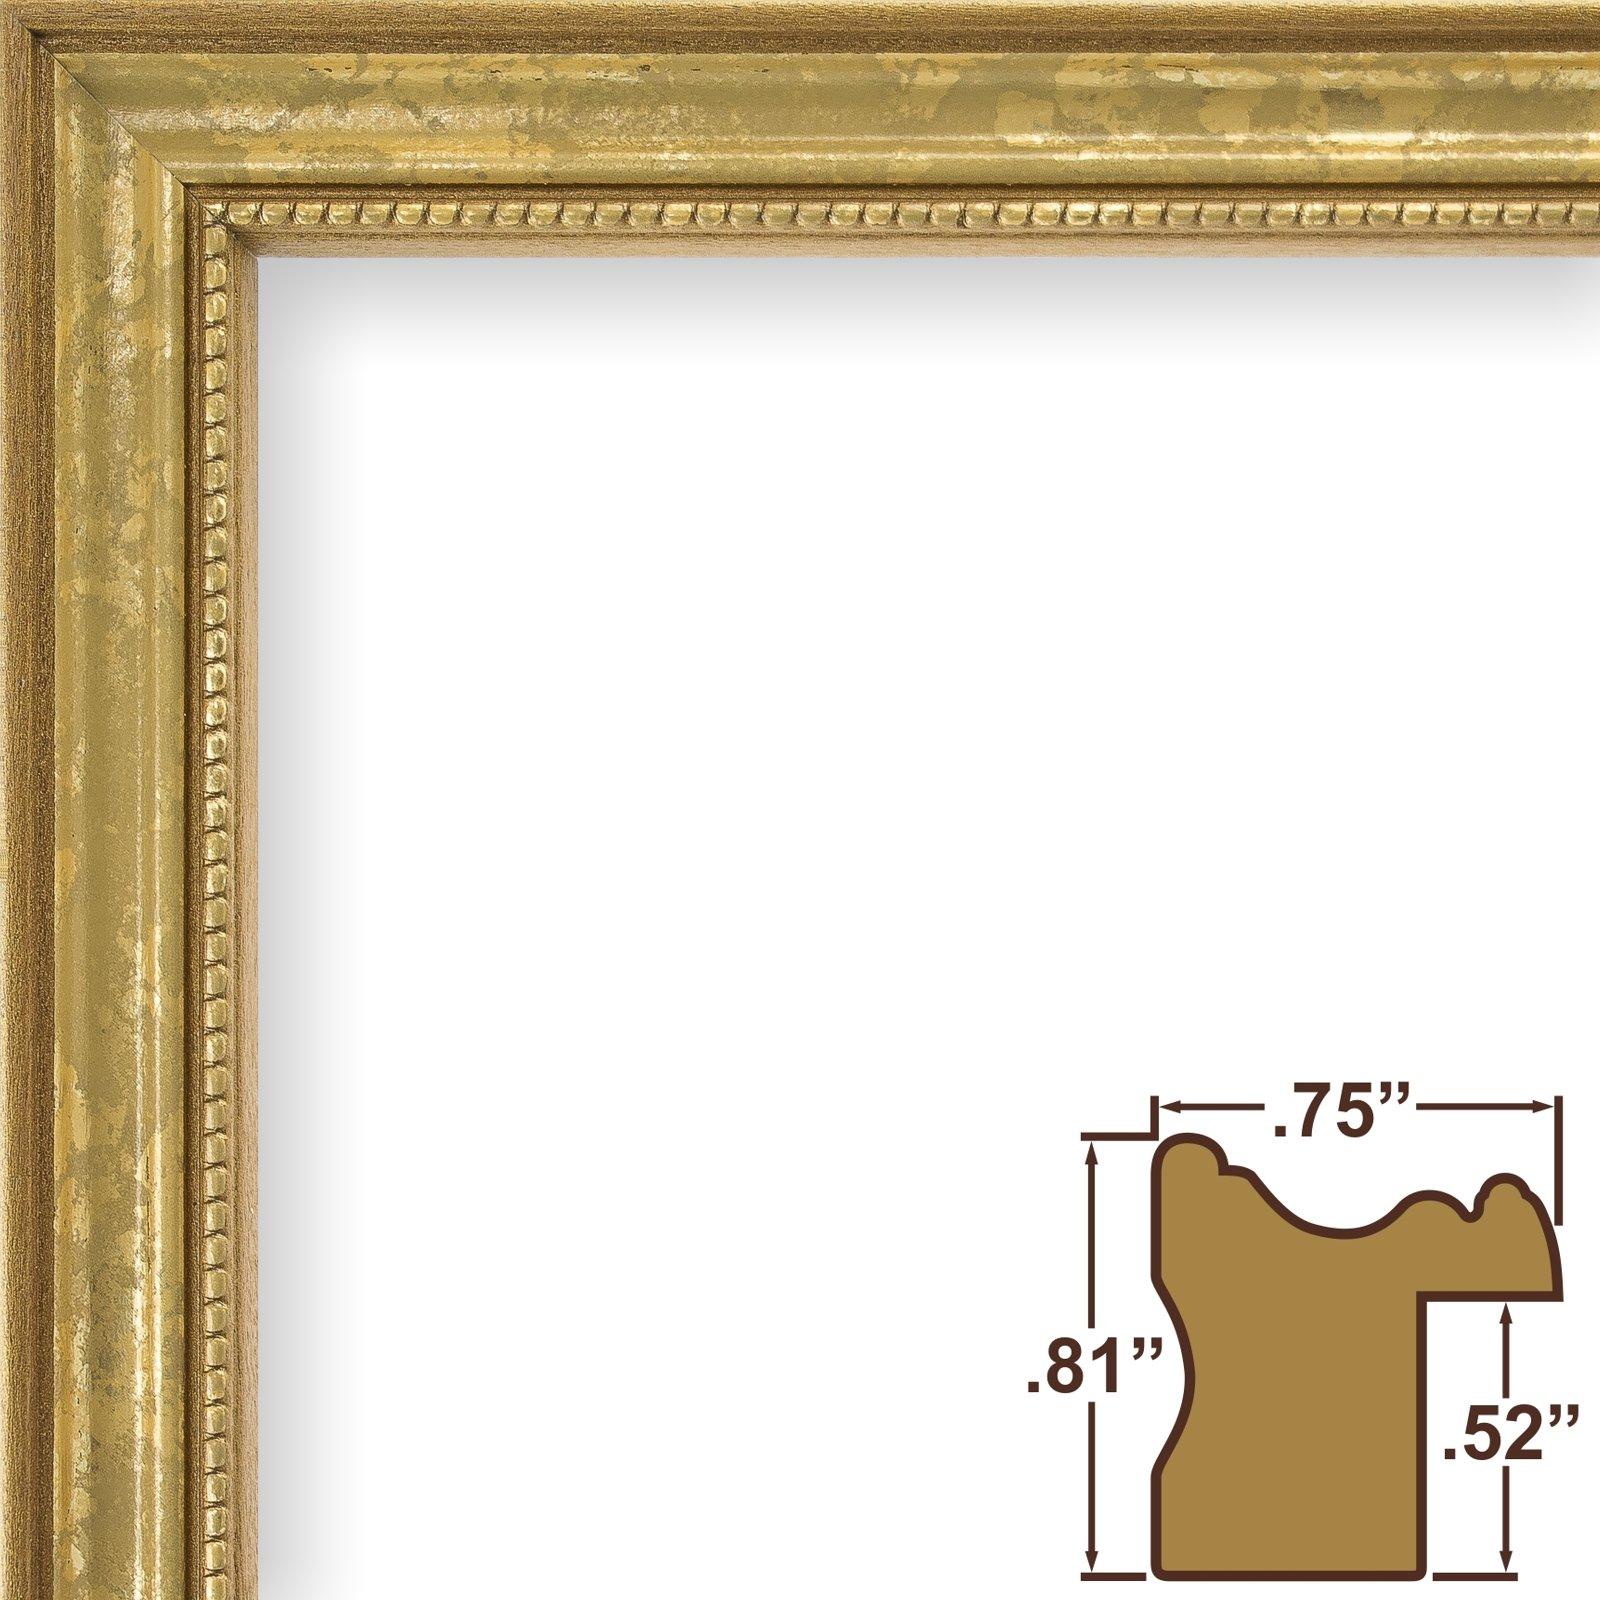 Craig Frames 314GD 24 x 36-Inch Picture Frame, Ornate Finish, 0.75-Inch Wide, Ornate Gold by Craig Frames (Image #2)